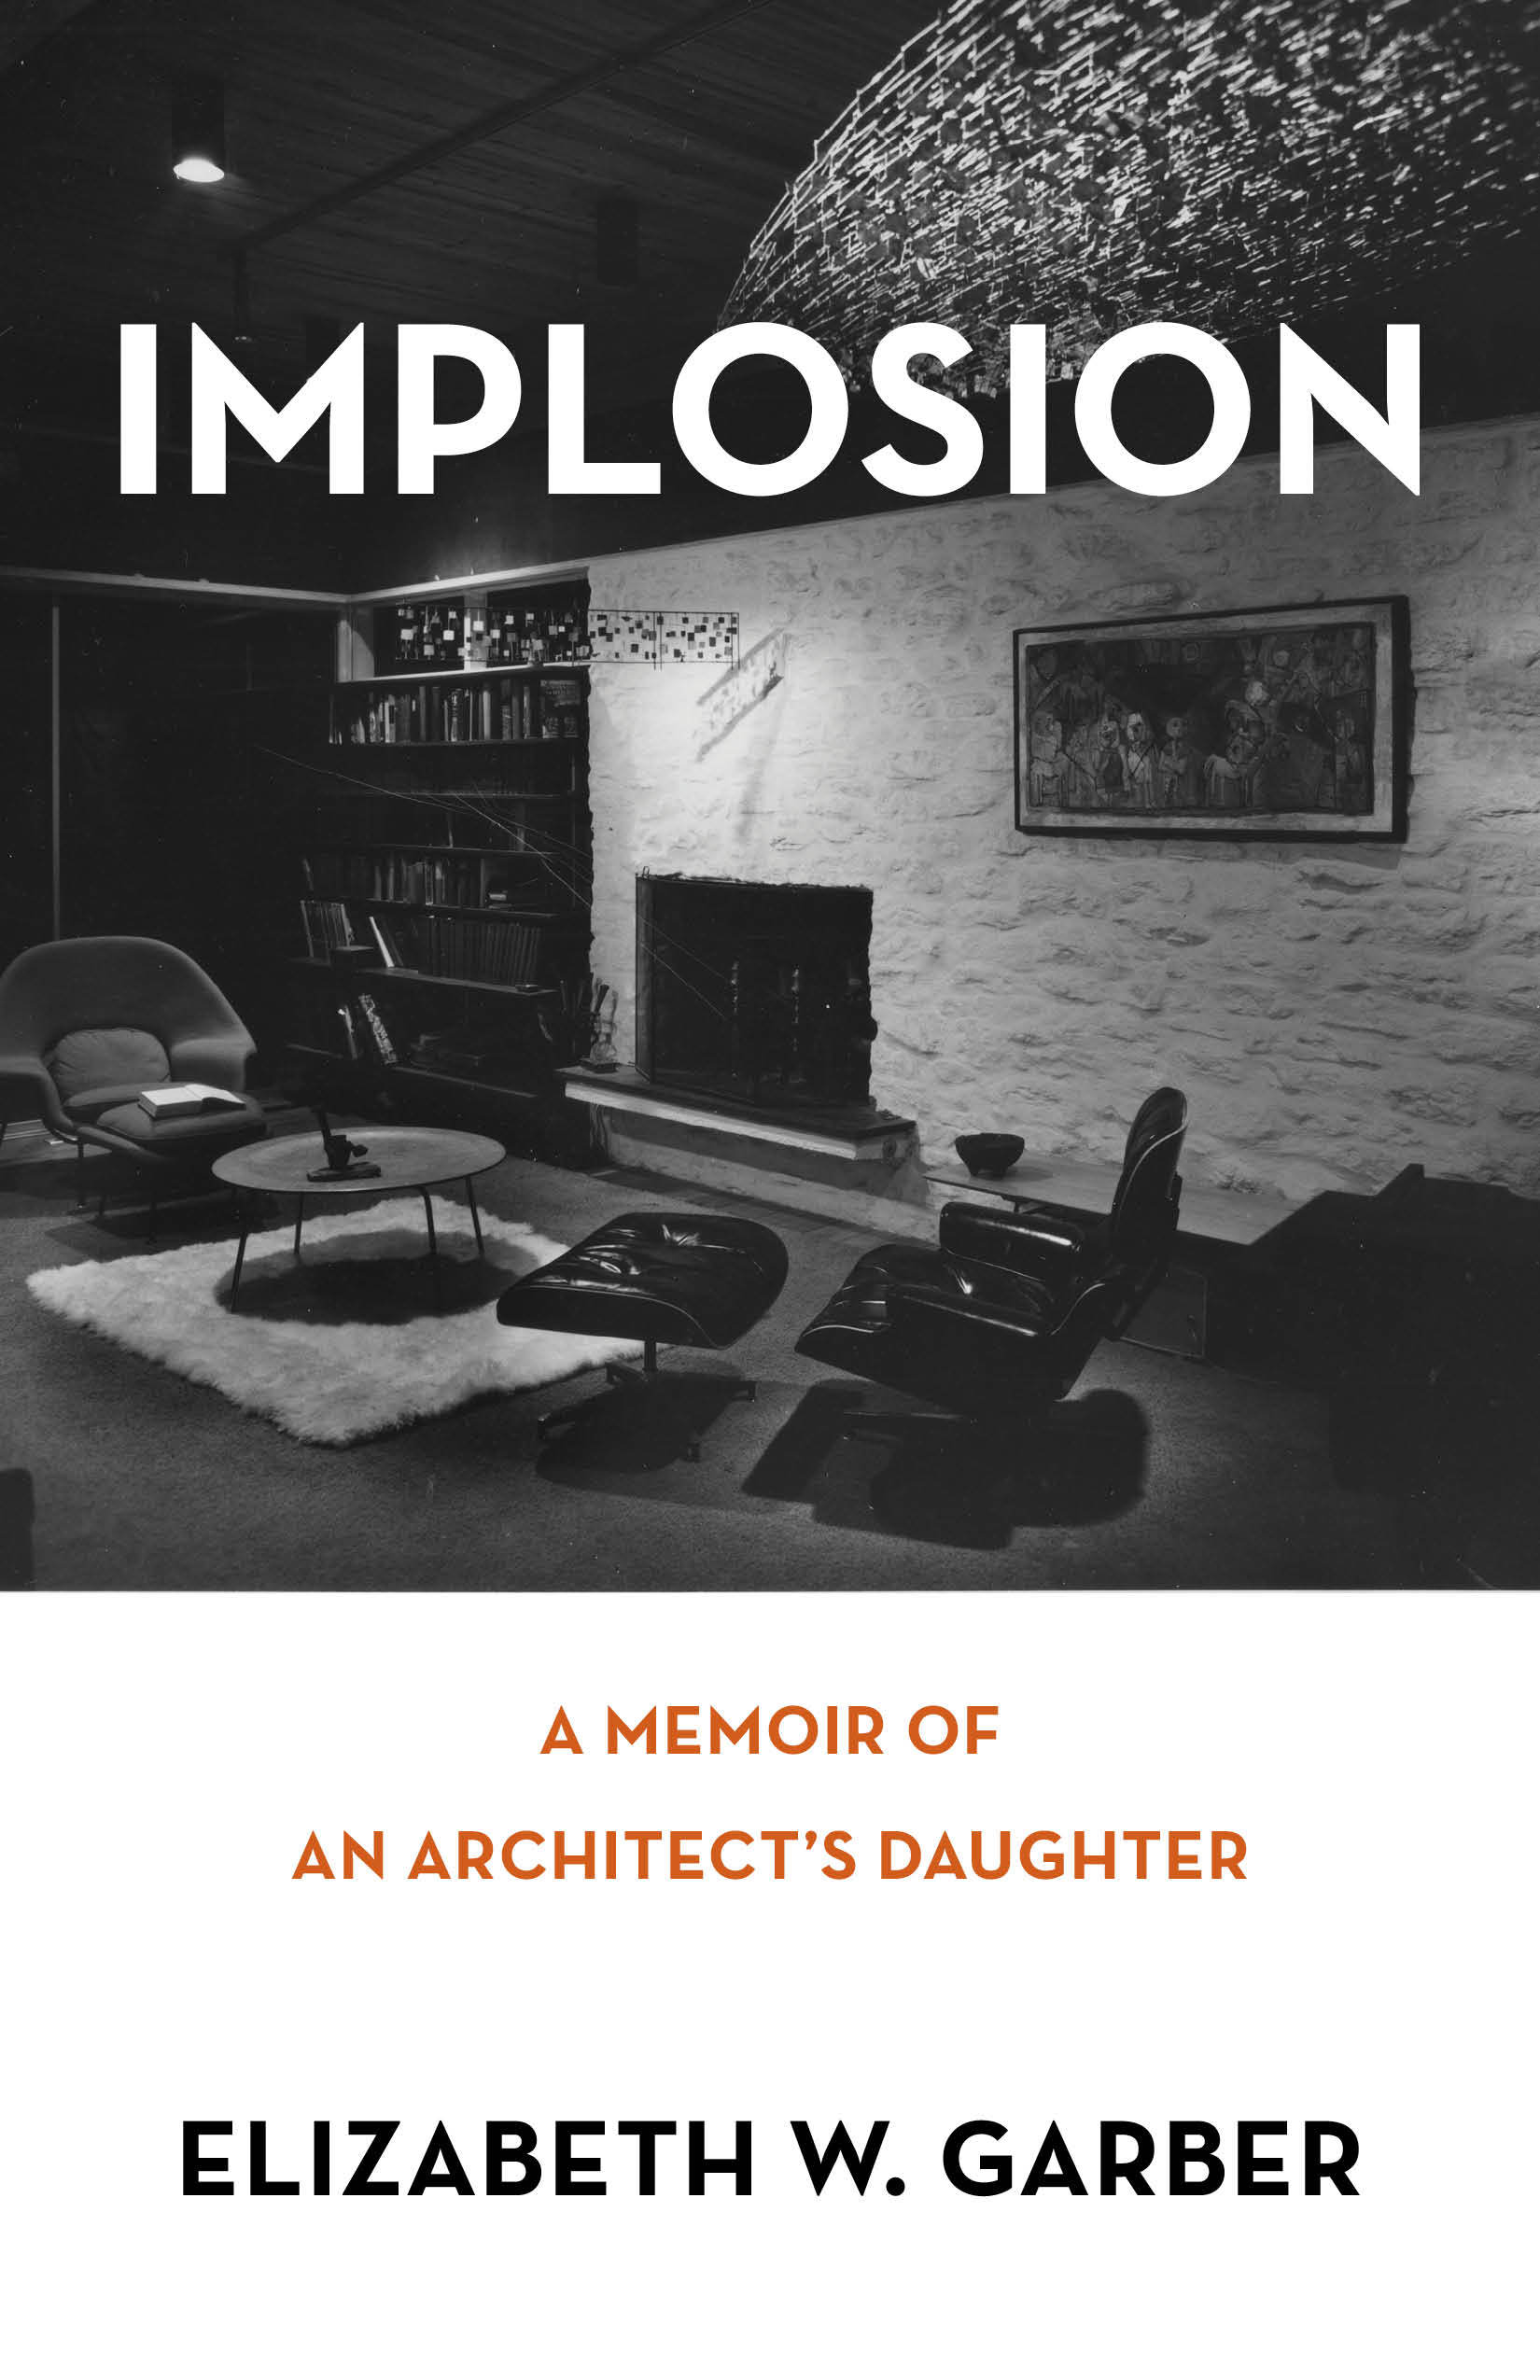 Implosion Memoir of an Architect's Daughter